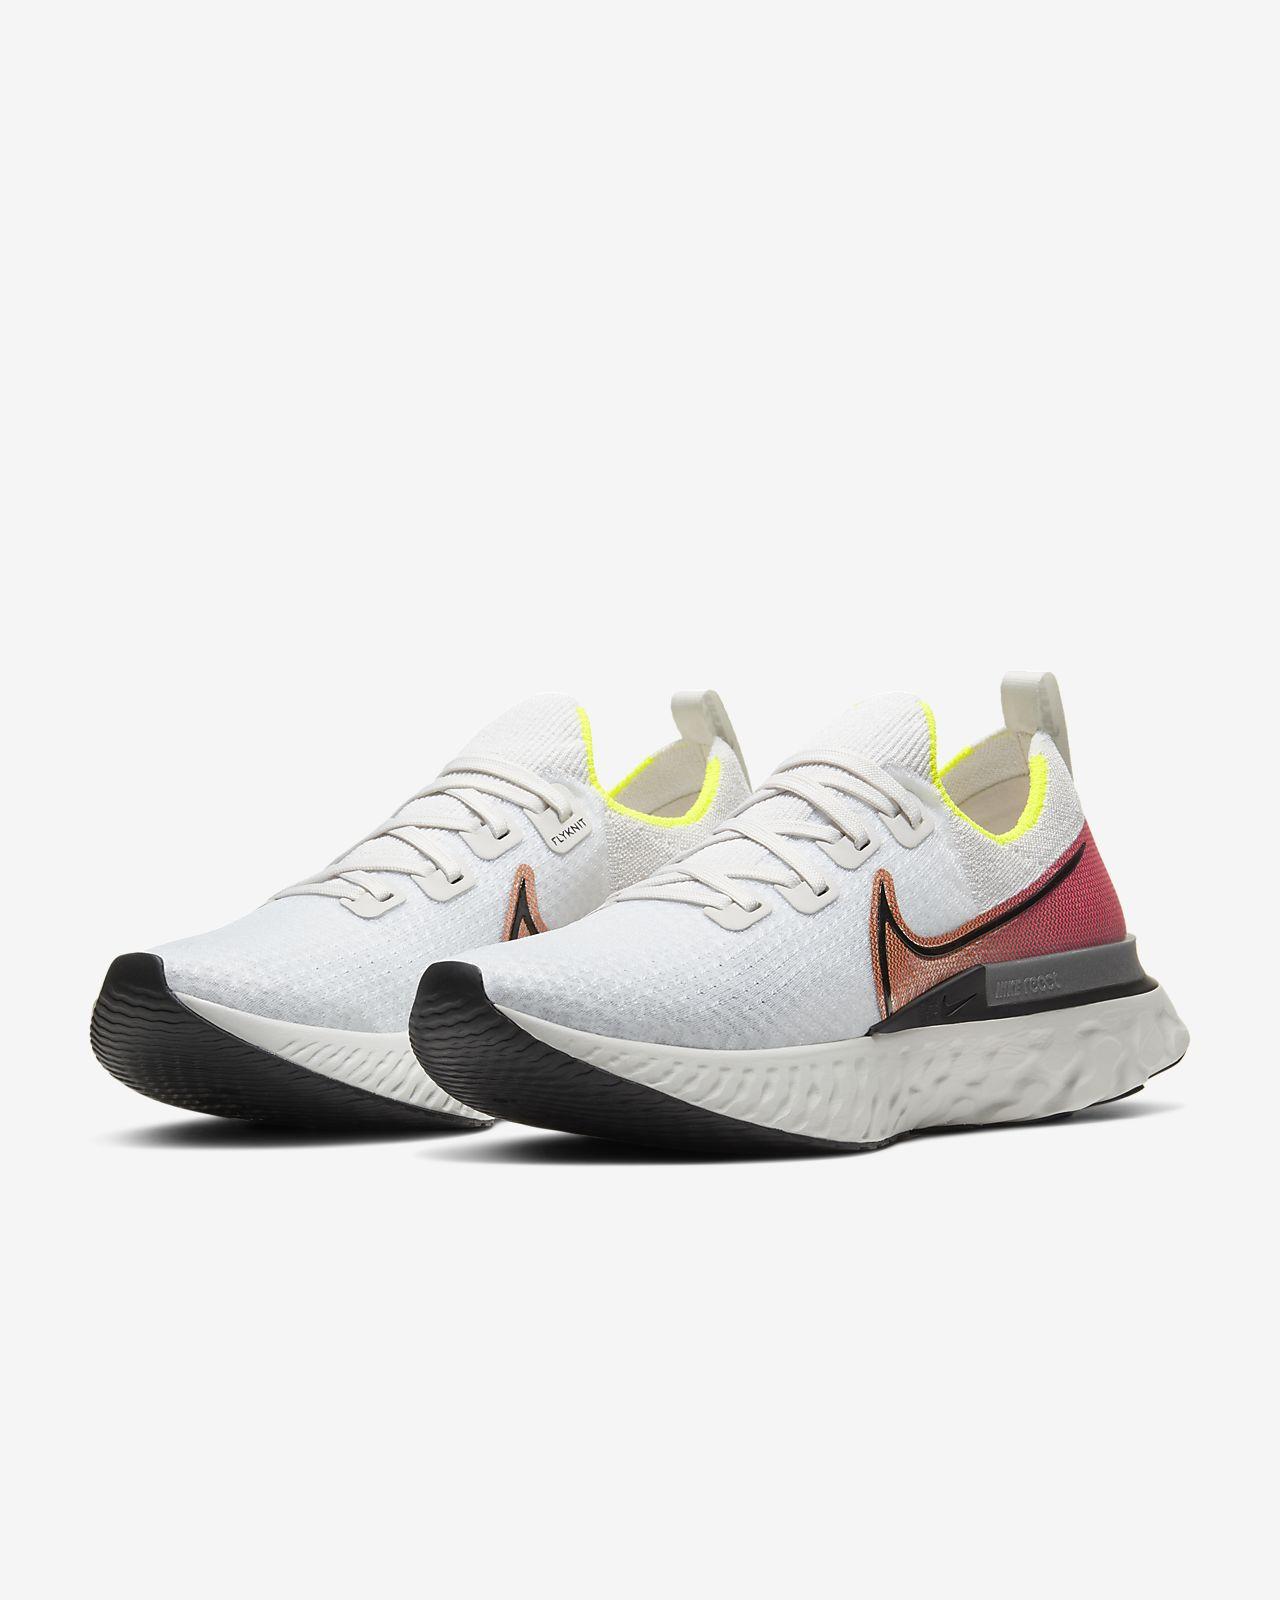 chaussures running universel pronateur,nike free run tier zero